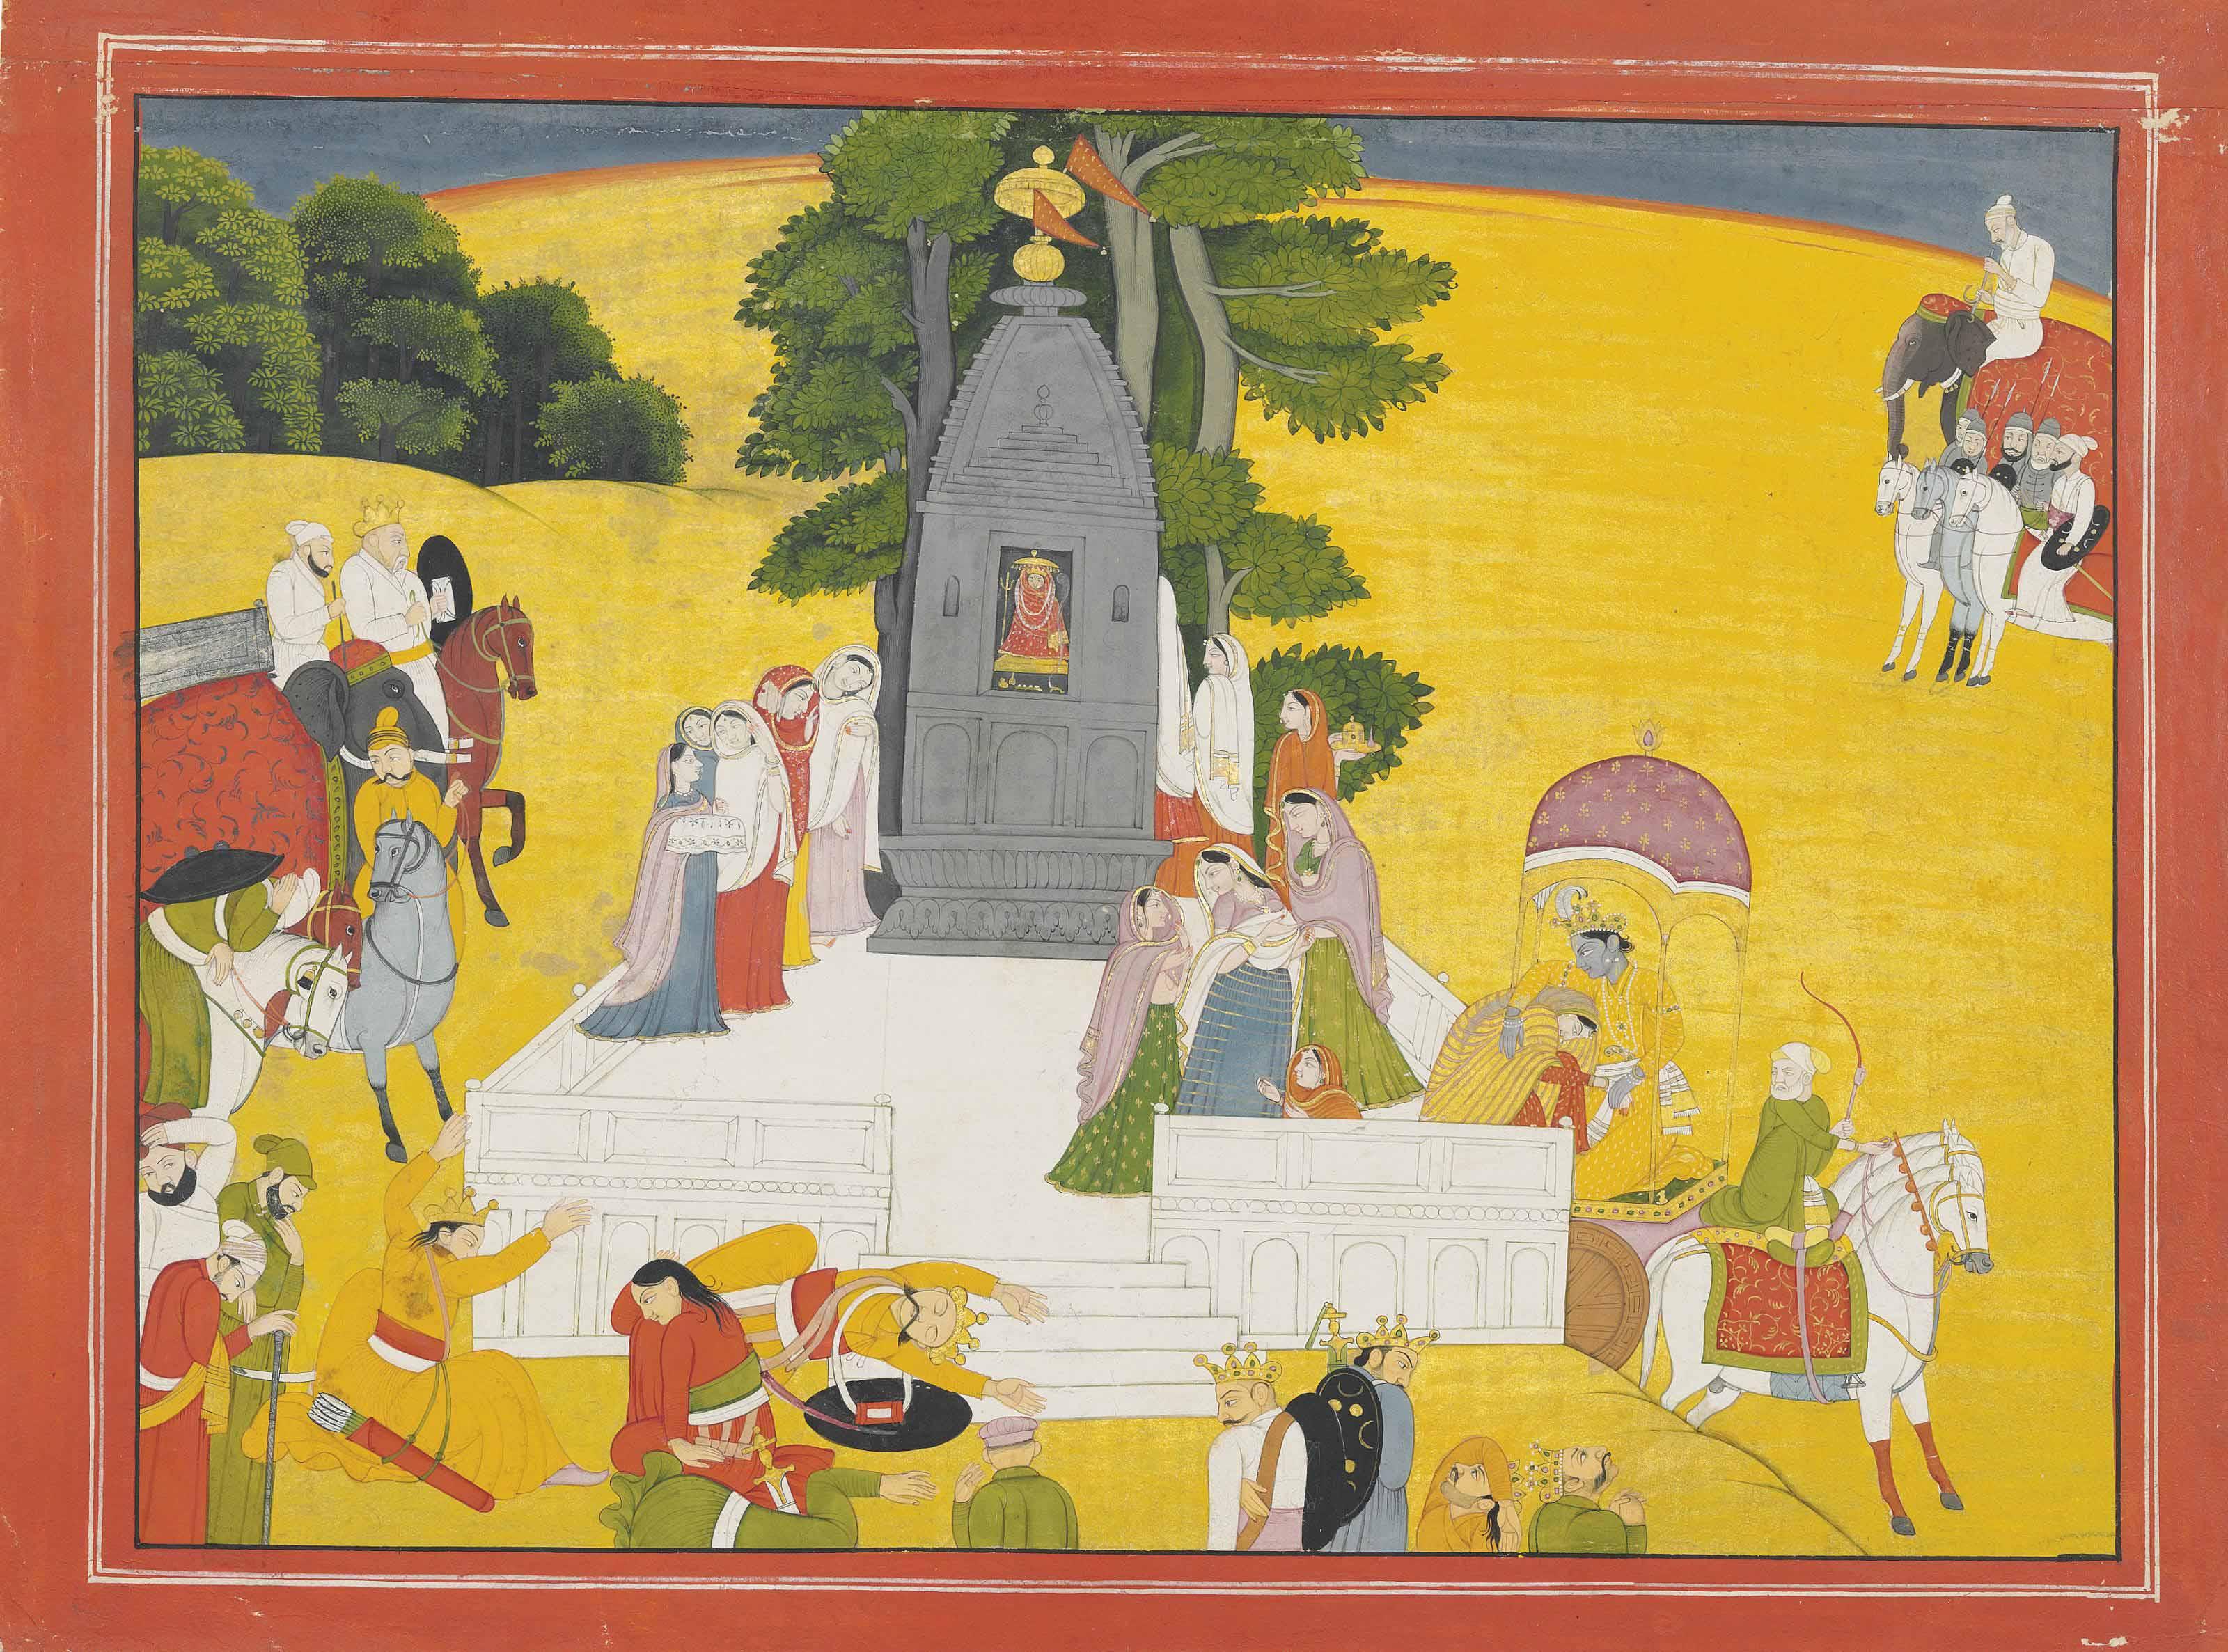 AN ILLUSTRATION TO THE BHAGAVA